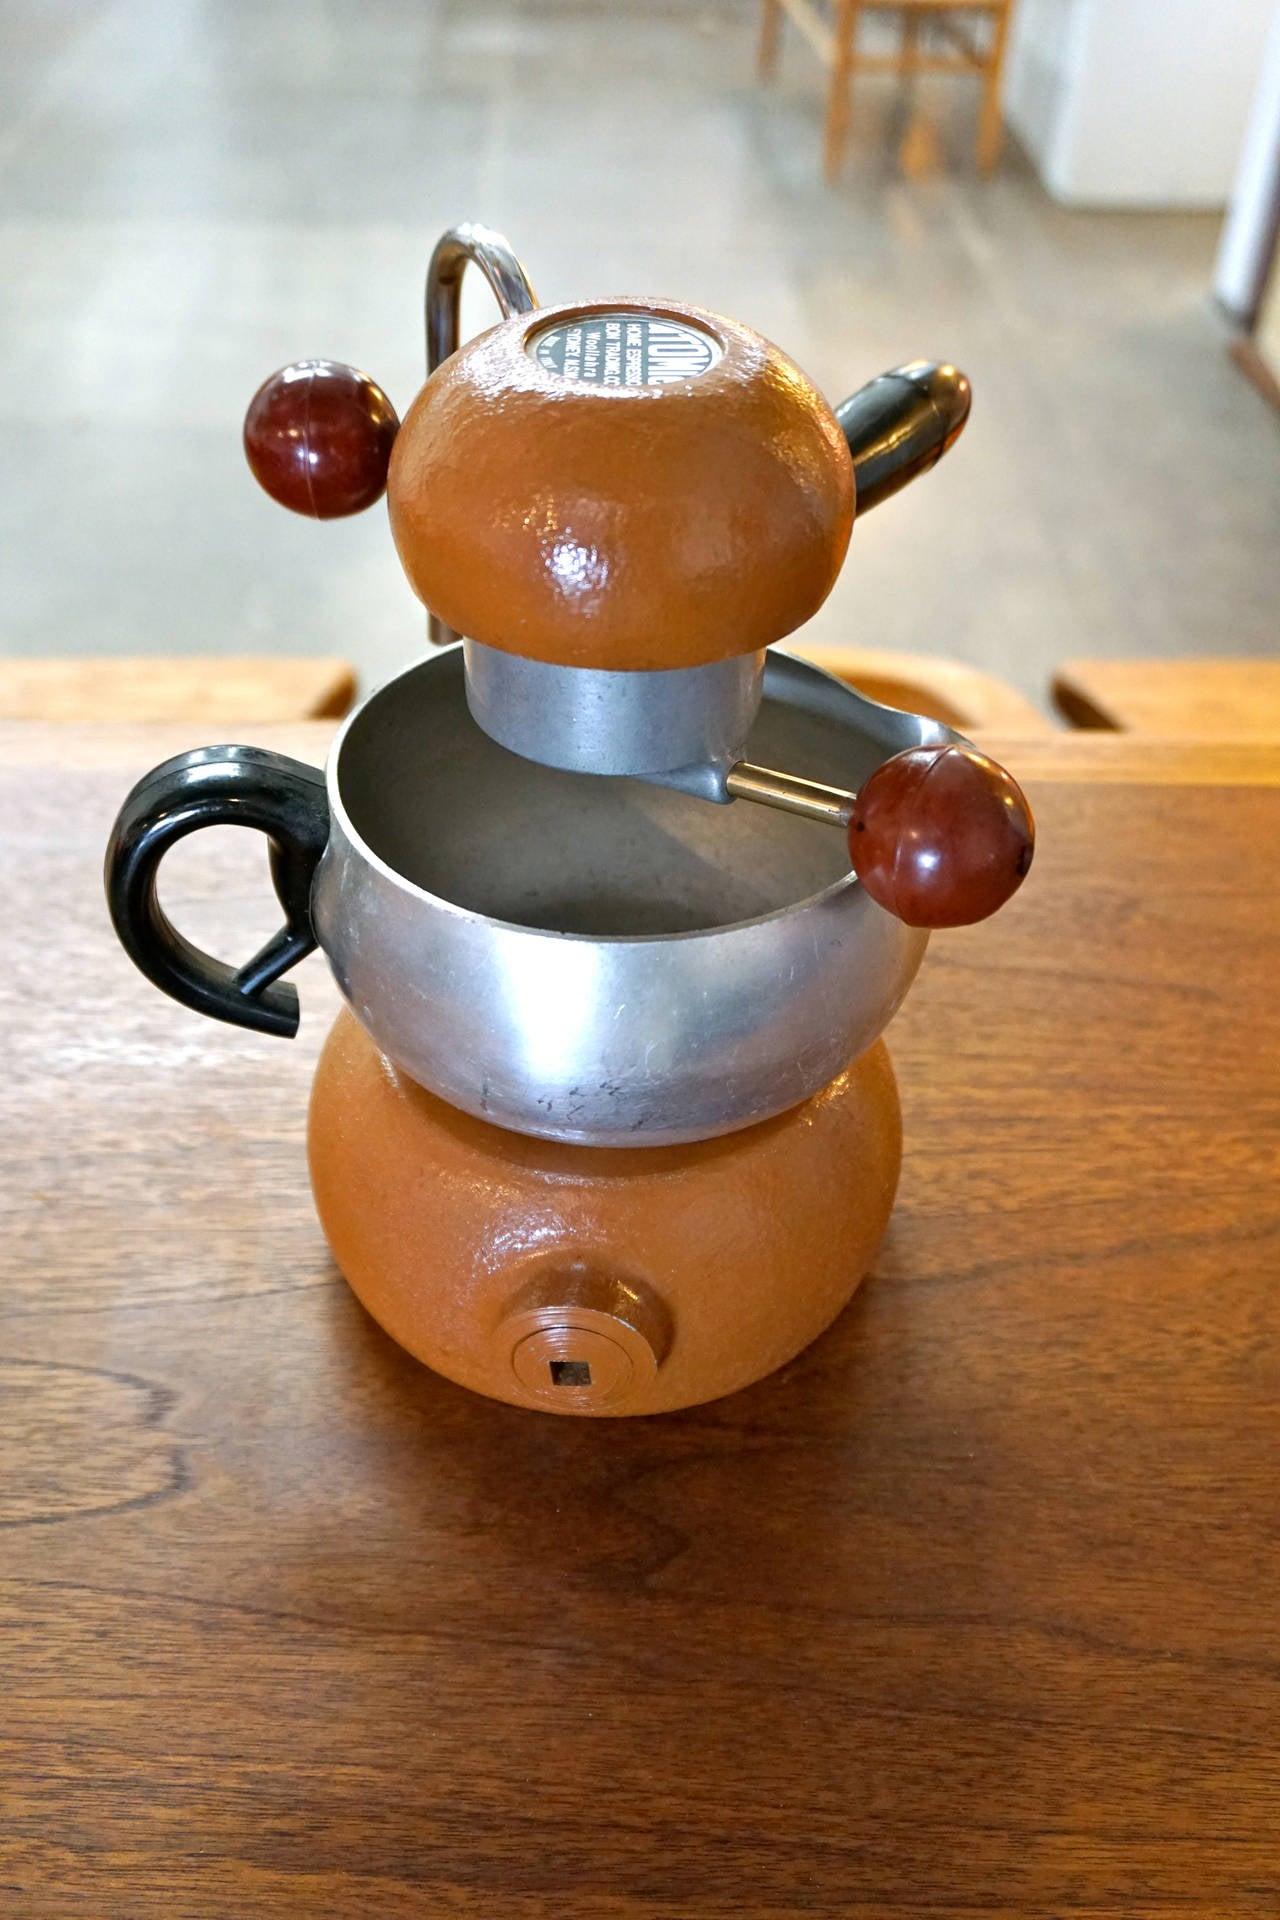 Atomic Coffee Maker How To Use : Atomic Brevetti Robbiati Espresso Maker at 1stdibs